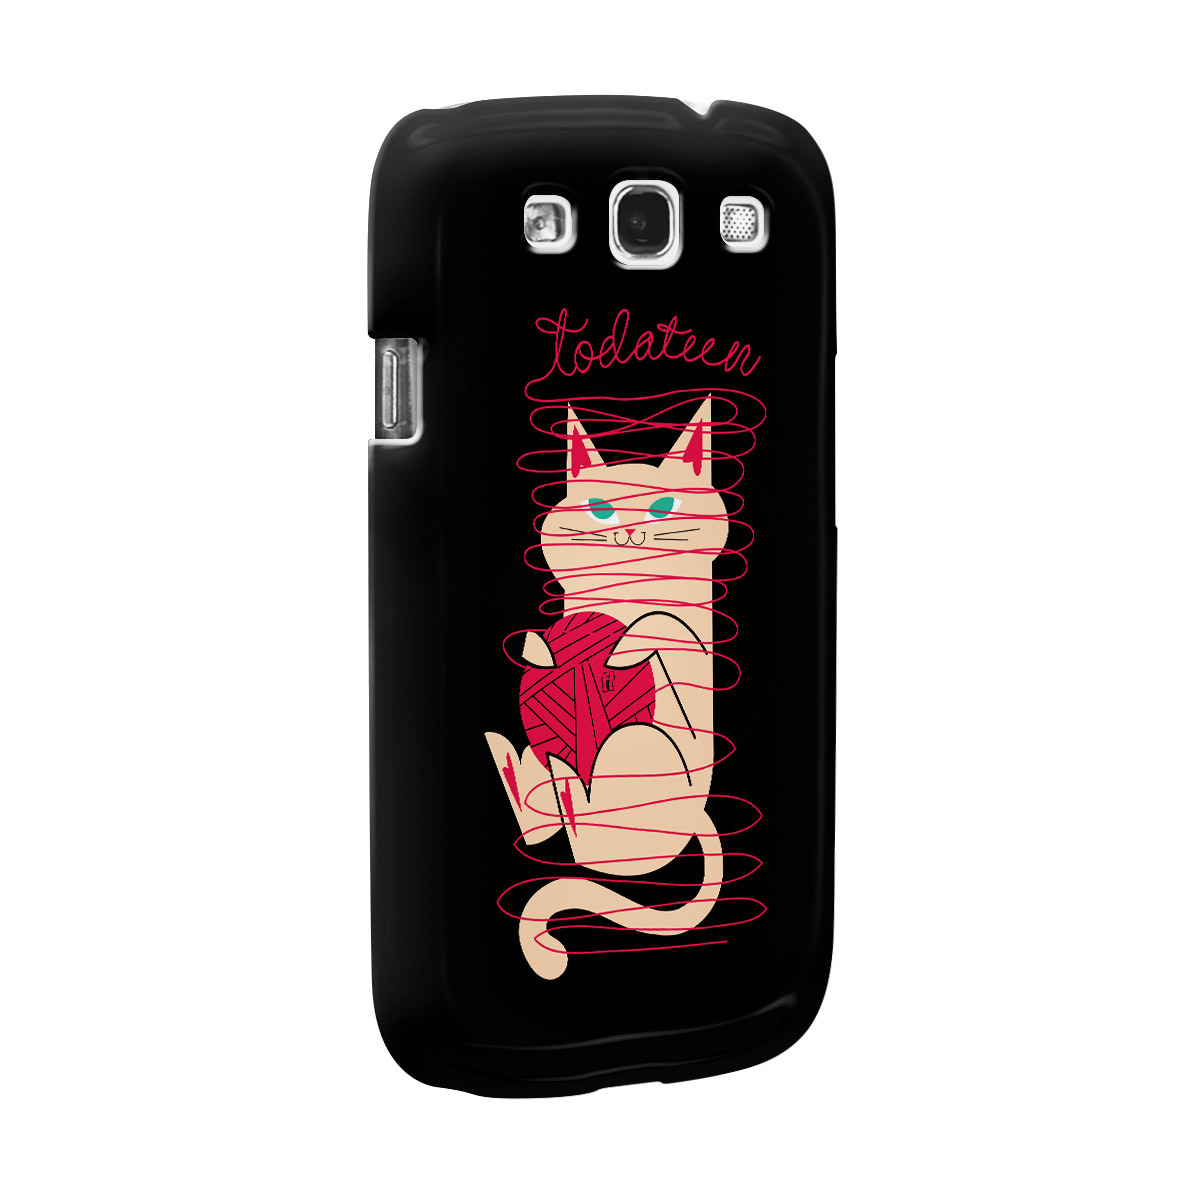 Capa para Galaxy S3 TodaTeen Cat